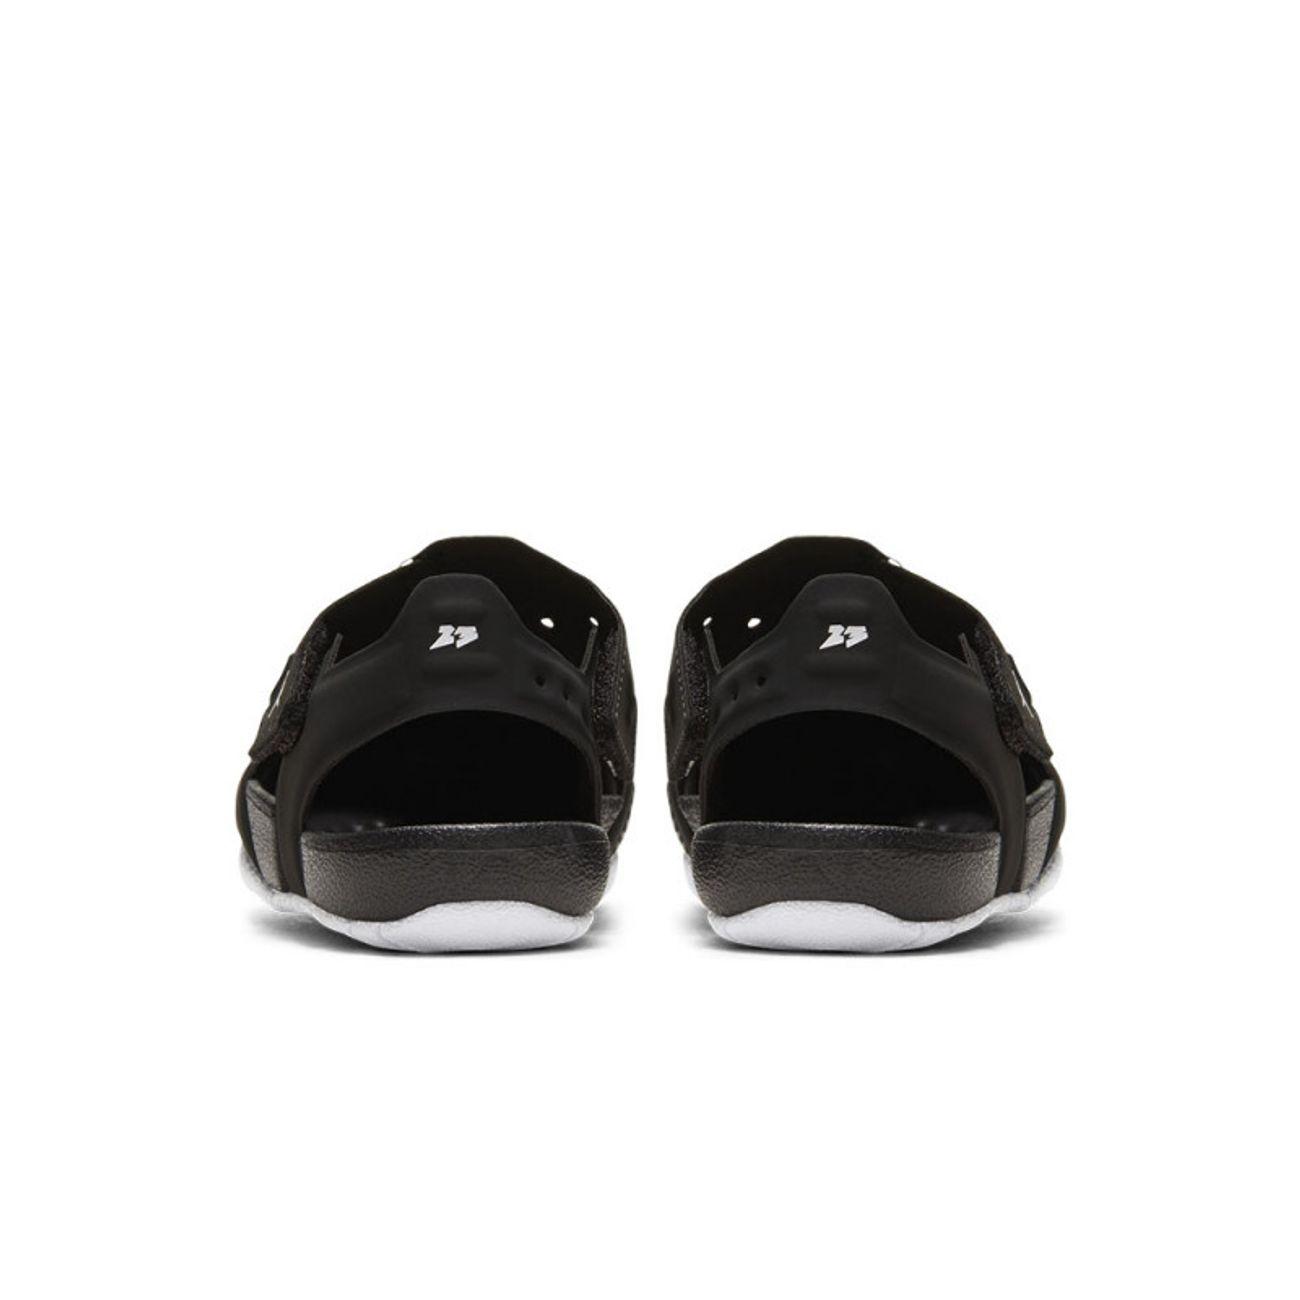 Mode- Lifestyle enfant NIKE Baskets Nike Jordan Flare Noir